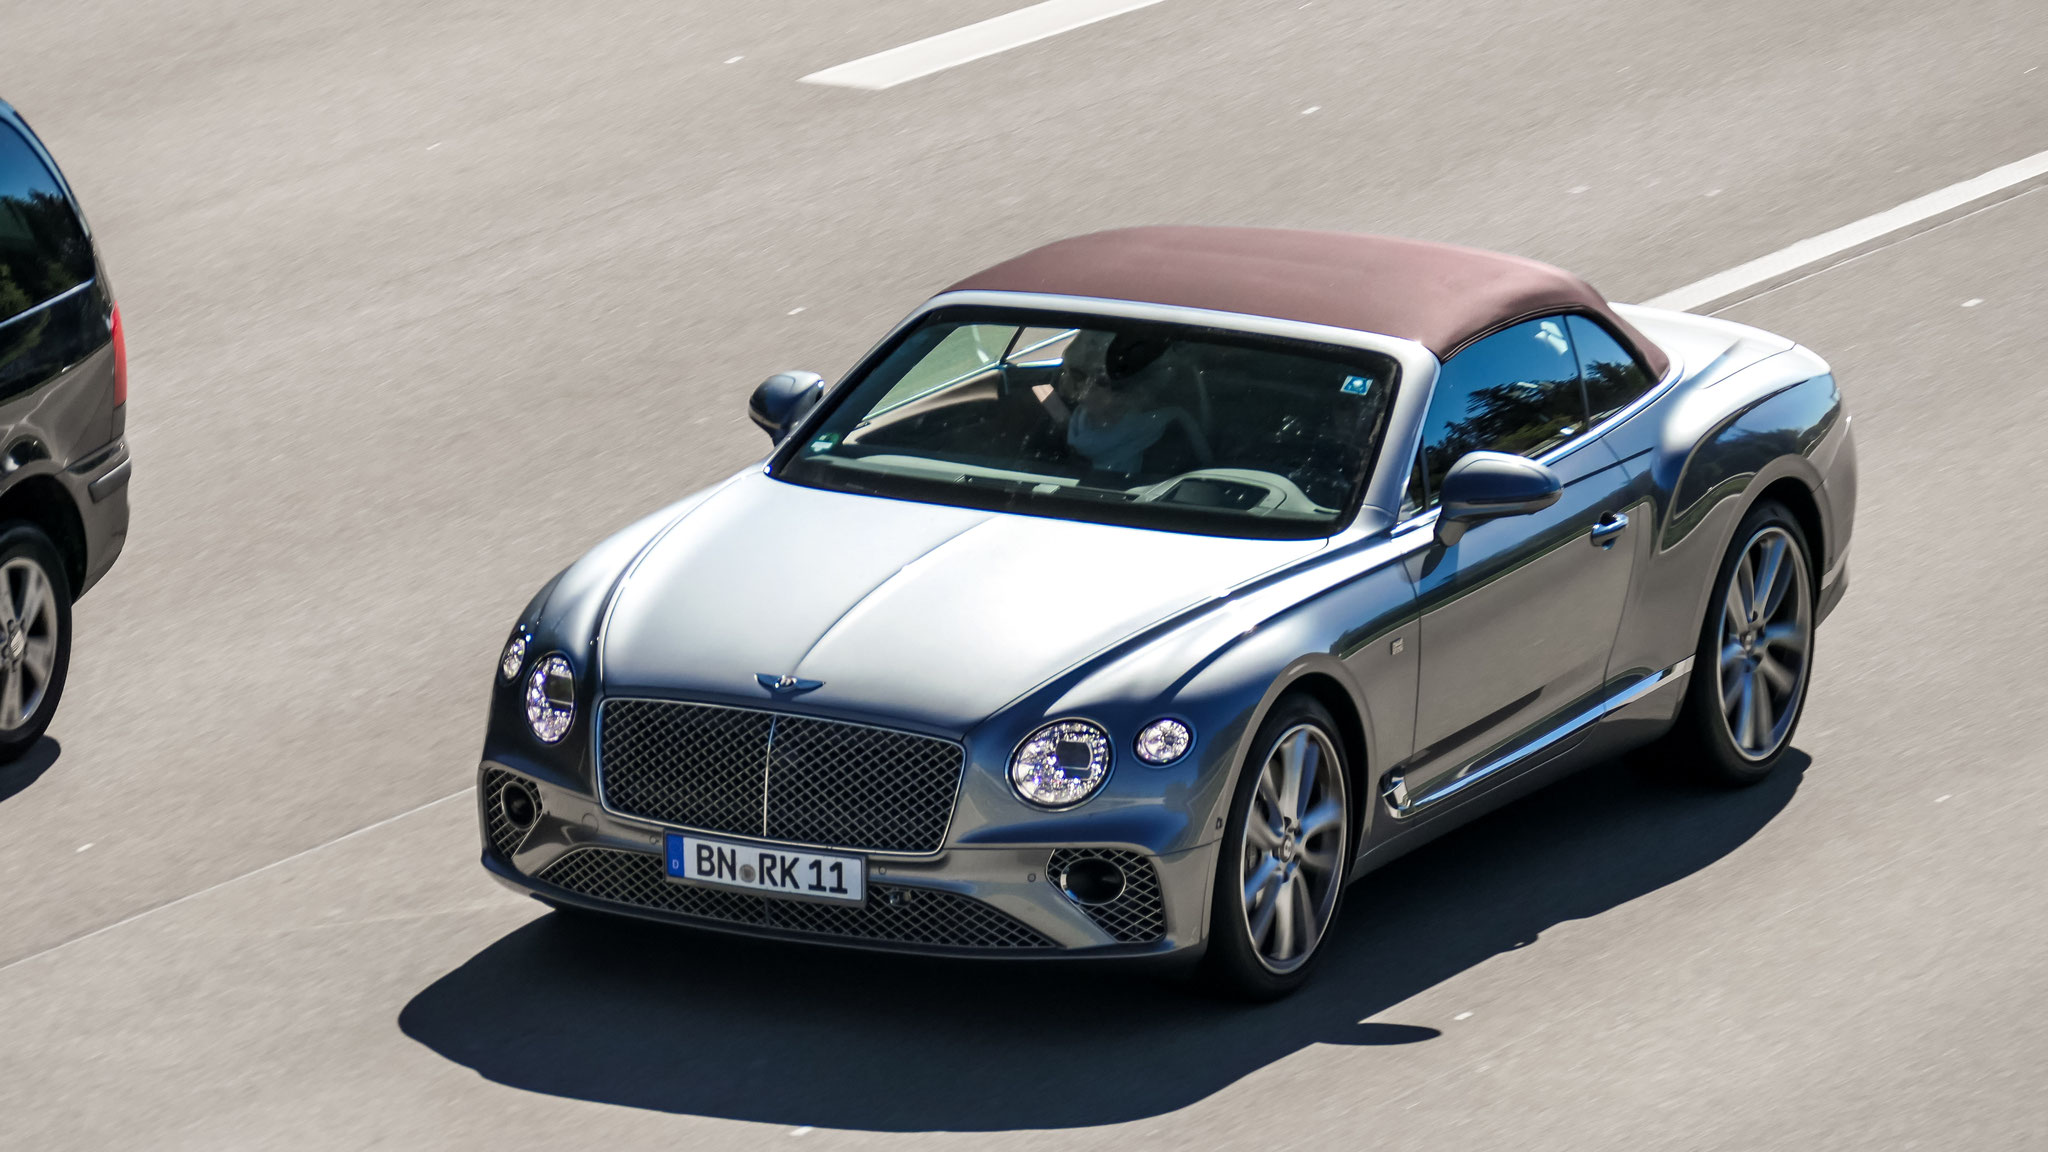 Bentley Continental GTC - BN-RK-11